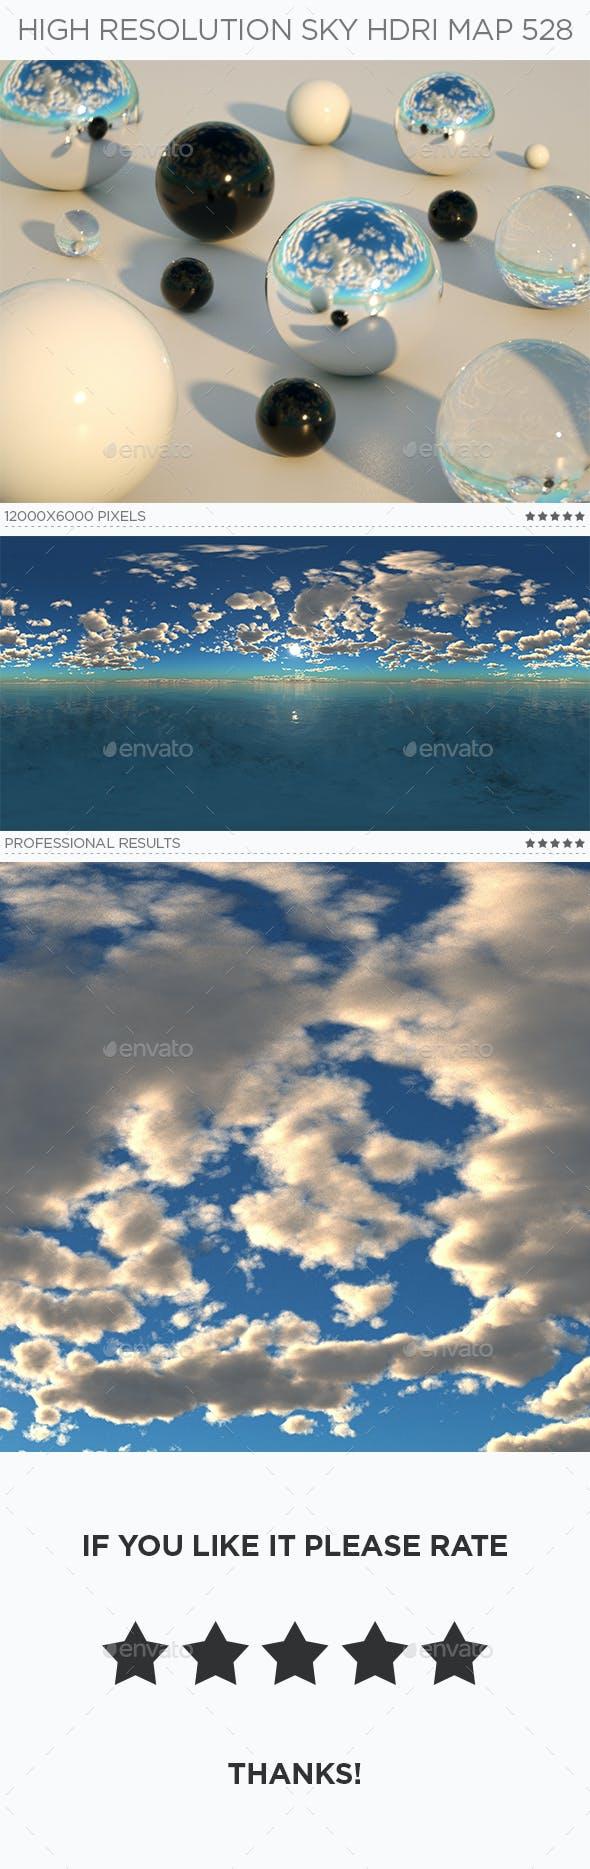 High Resolution Sky HDRi Map 528 - 3DOcean Item for Sale